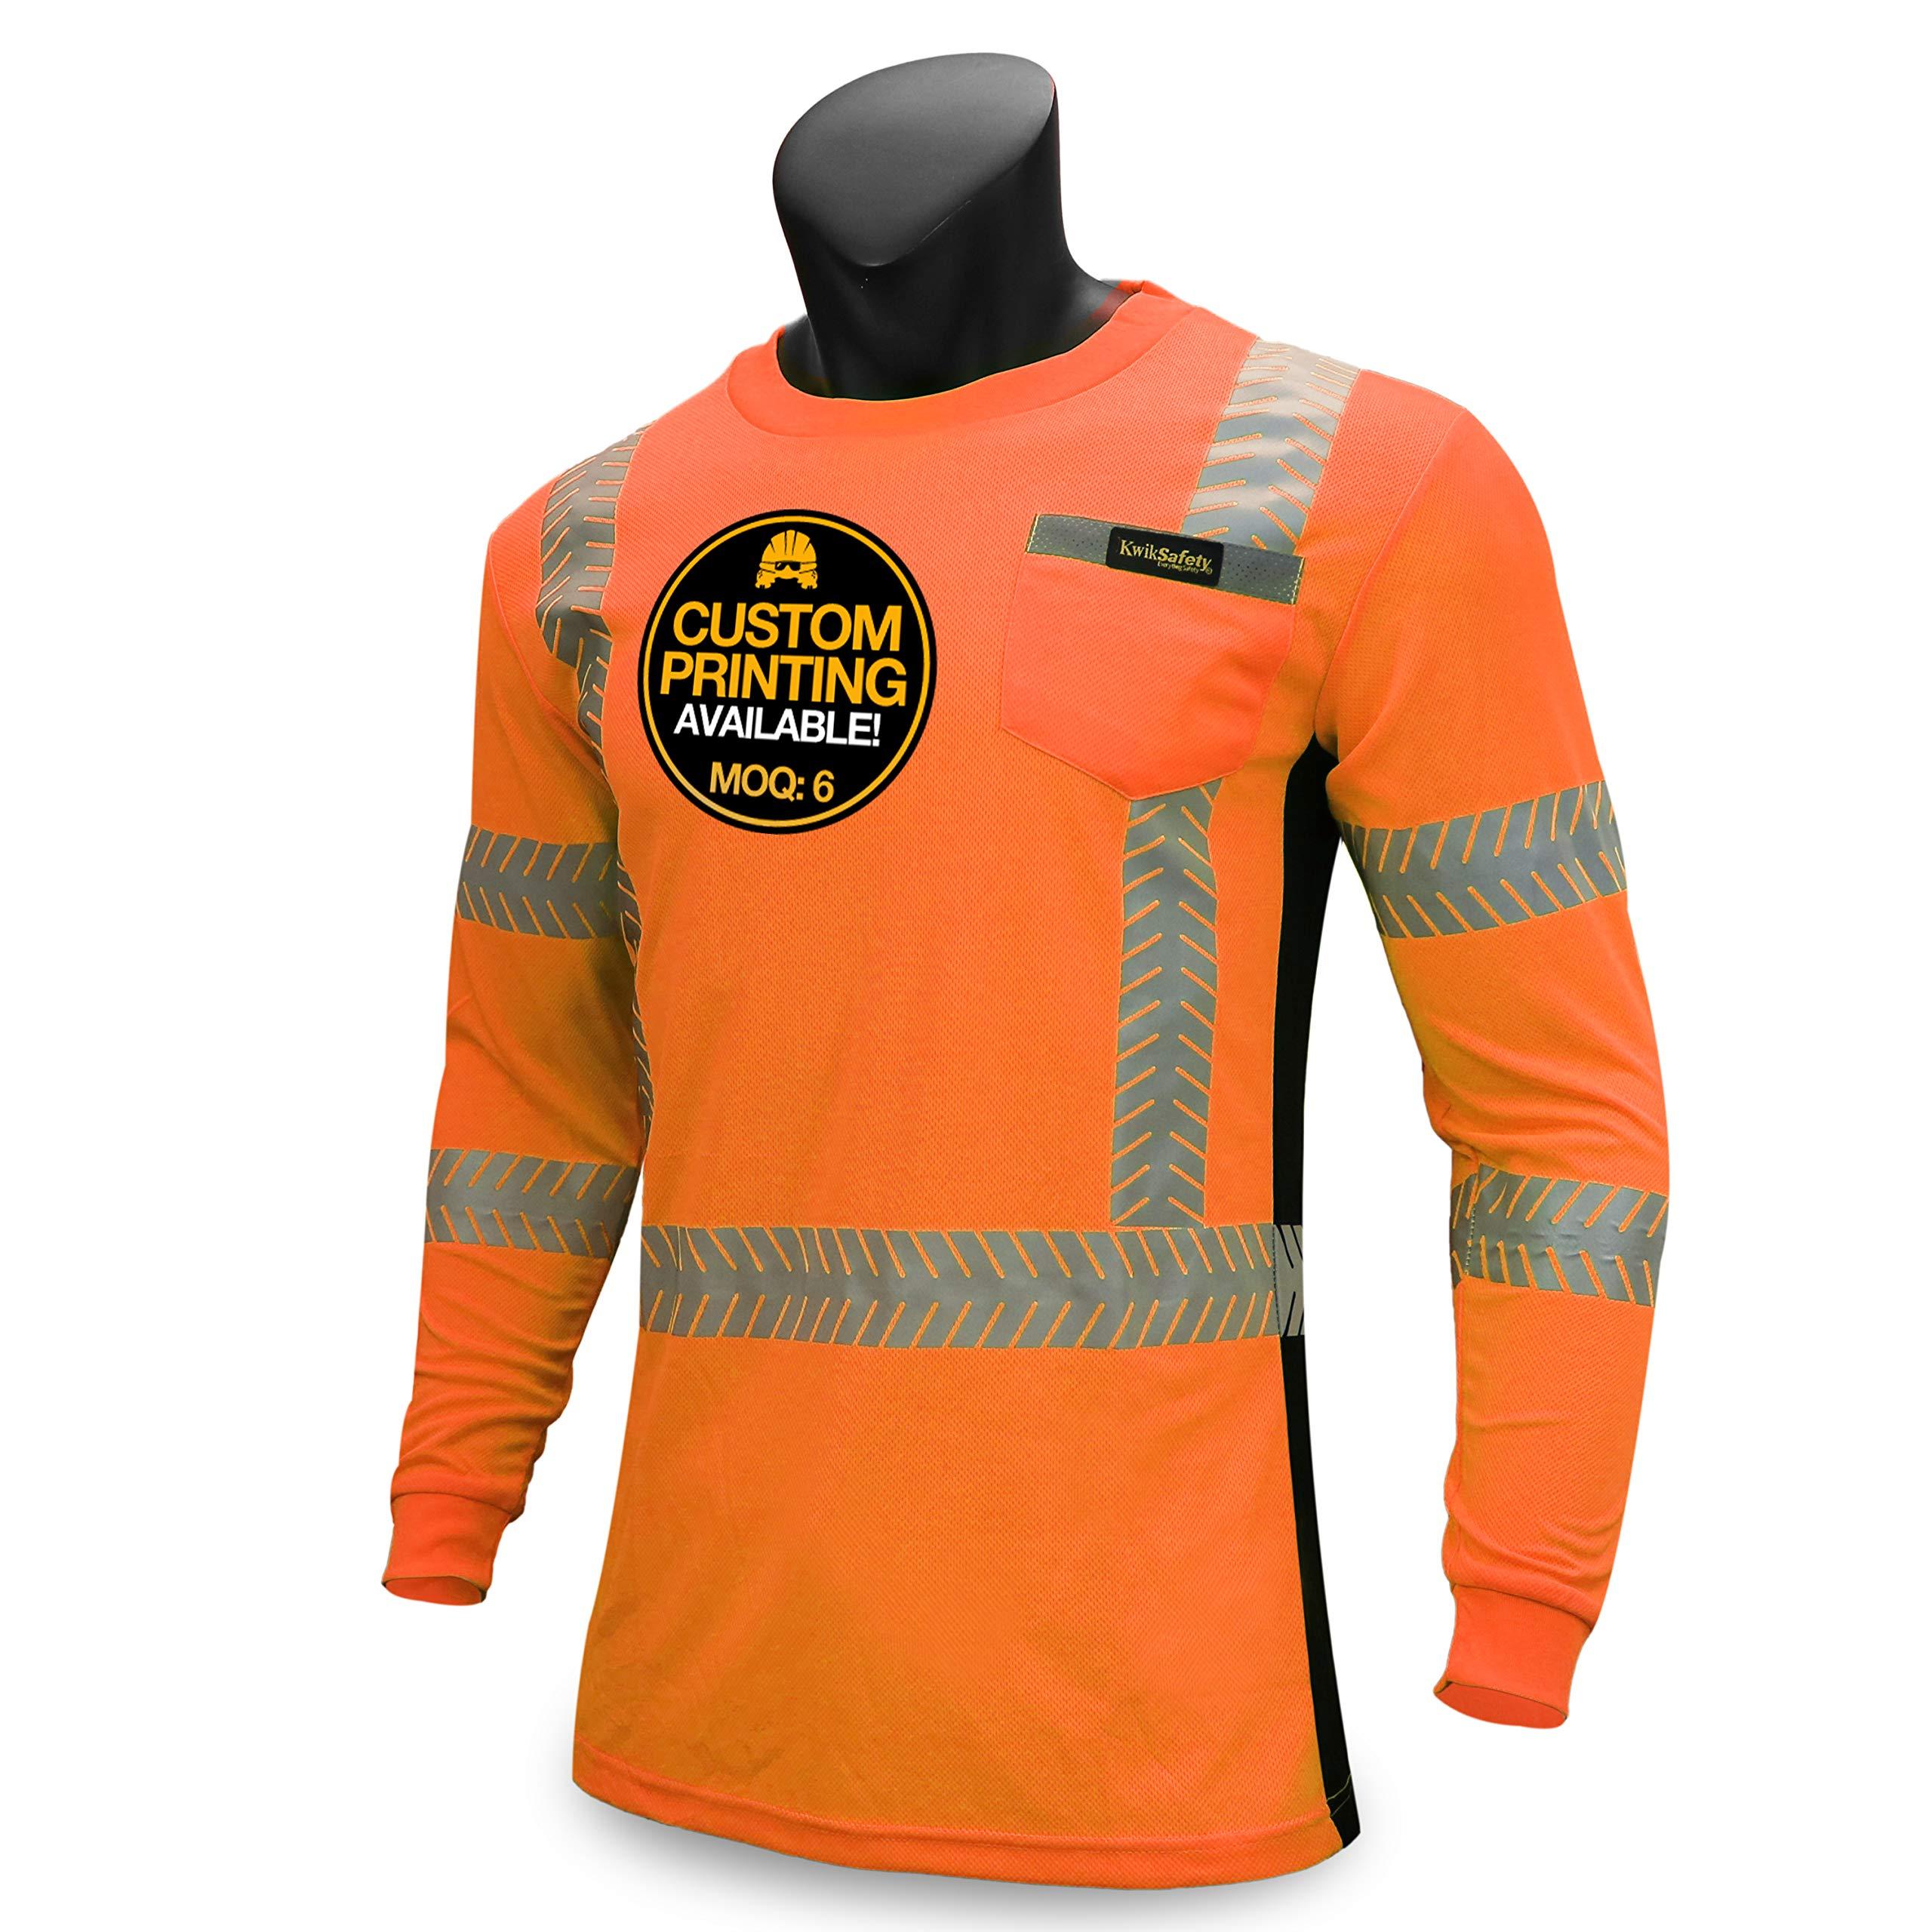 KwikSafety (Charlotte, NC) RENAISSANCE MAN (with POCKET) Class 3 ANSI High Visibility Safety Shirt Fishbone Reflective Tape Construction Security Hi Vis Clothing Men Long Sleeve Orange Black Large